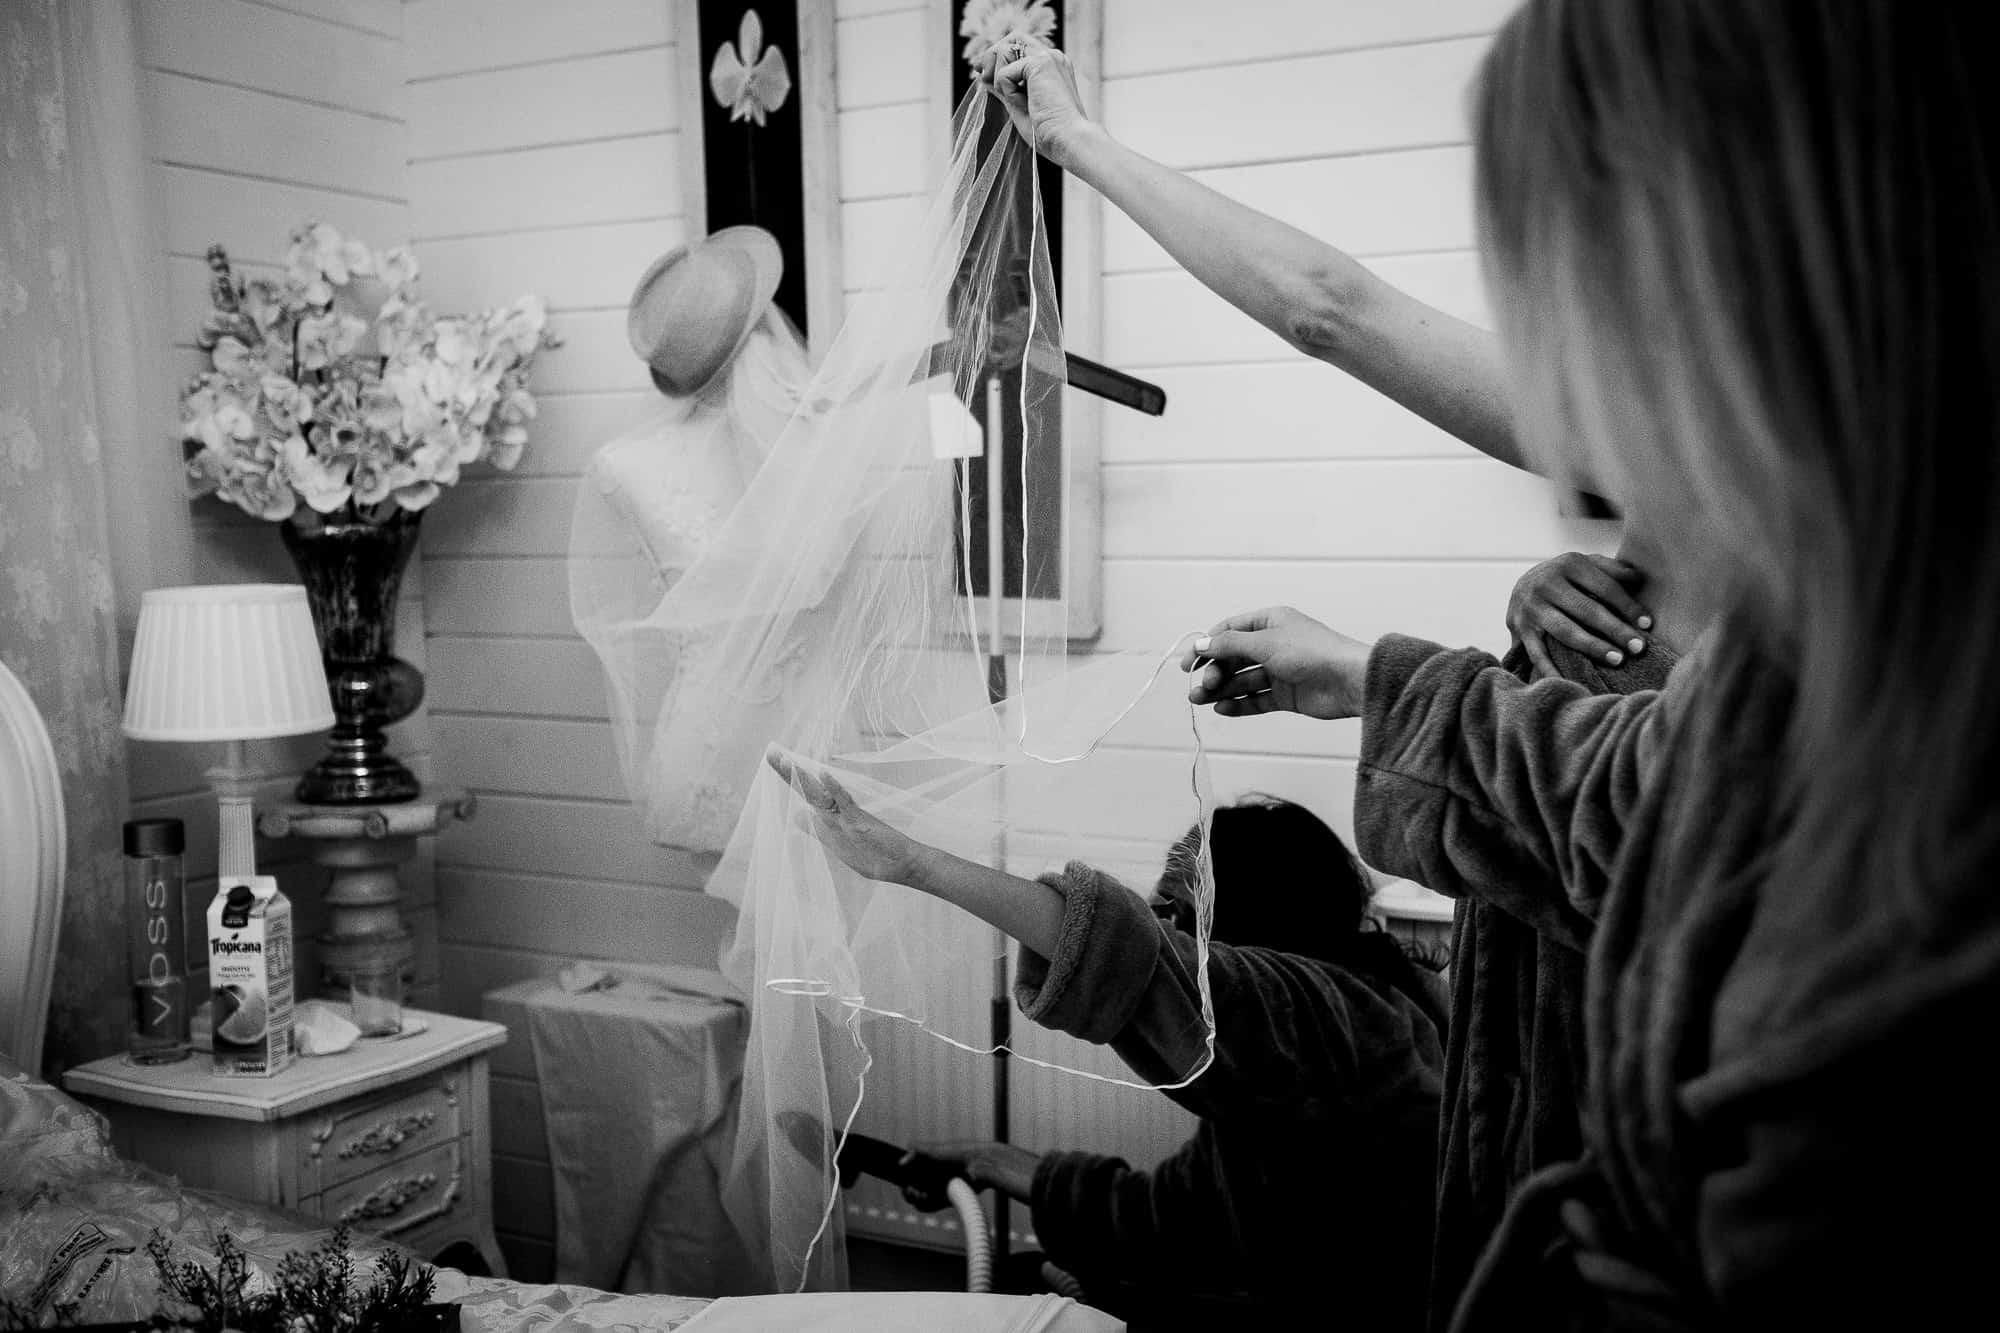 marleybrook-house-wedding-photography-matt-tyler-0011